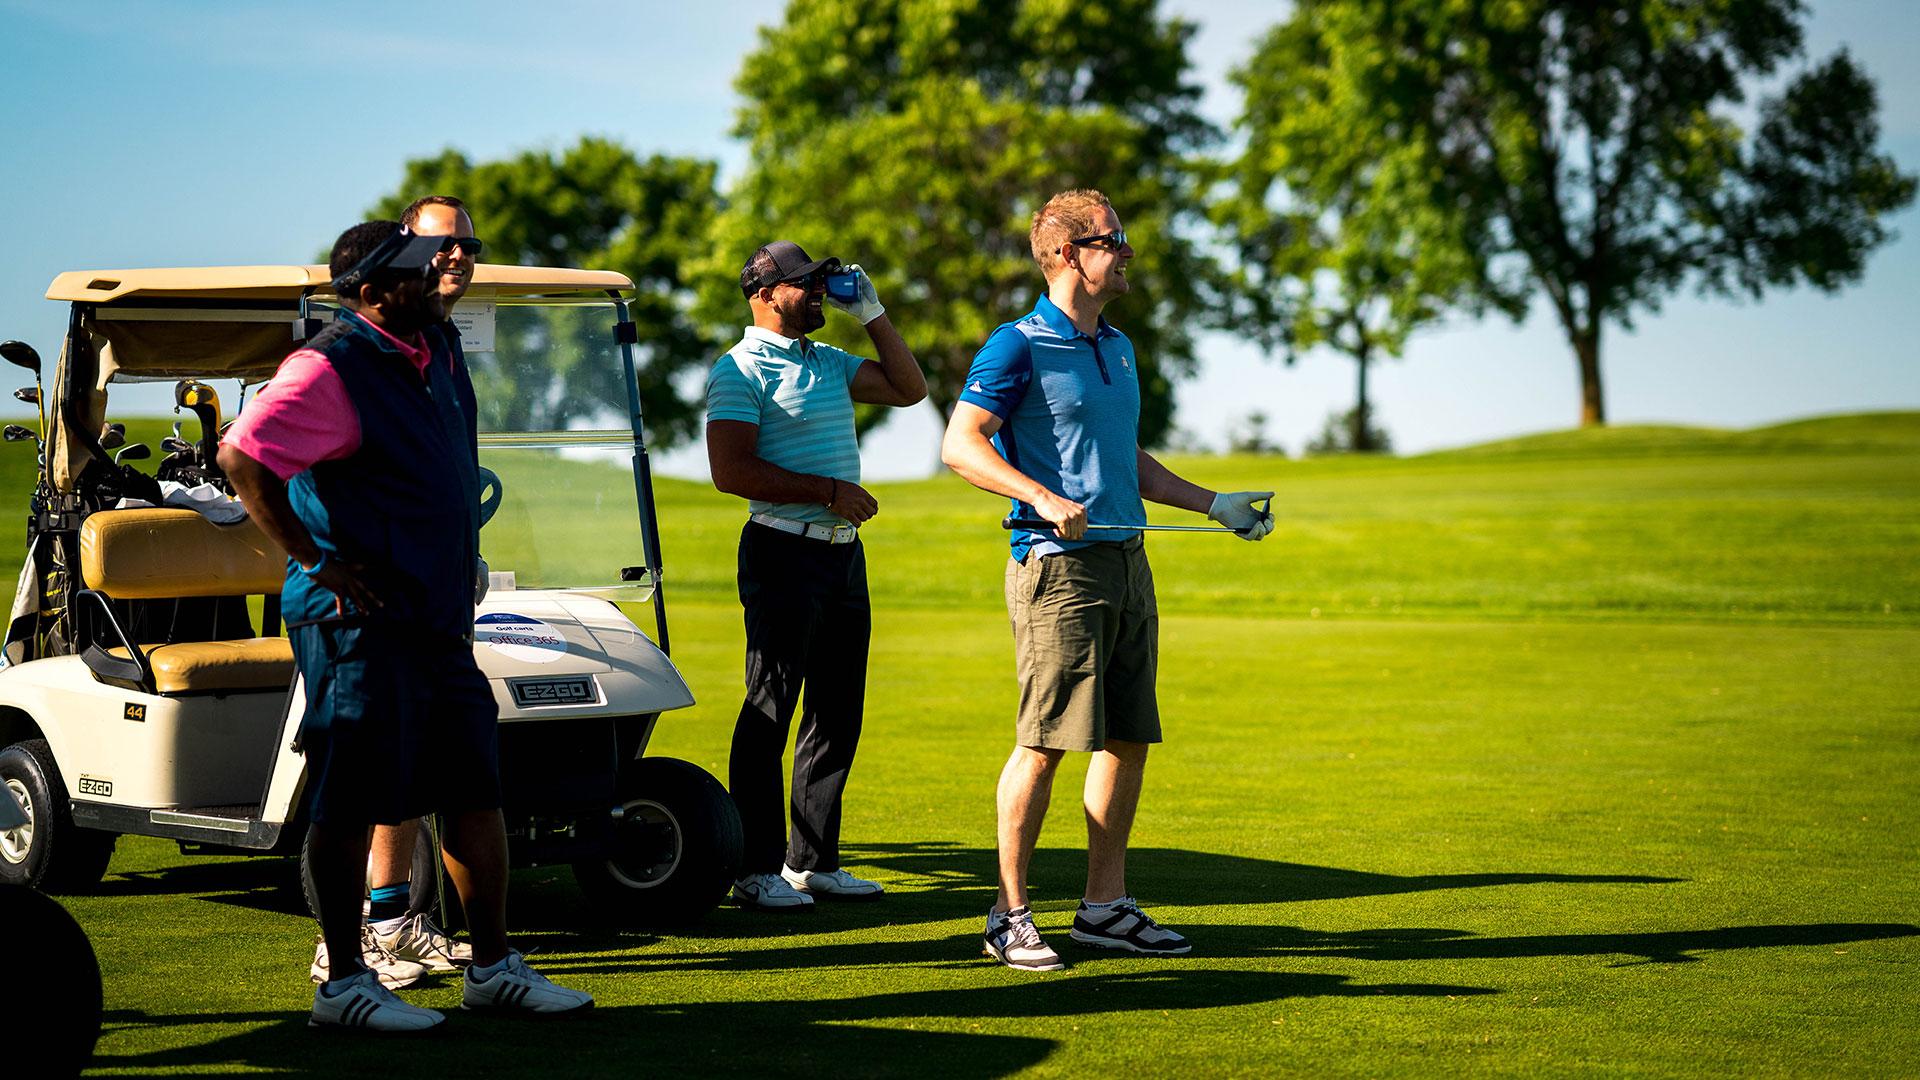 BBCC Golf